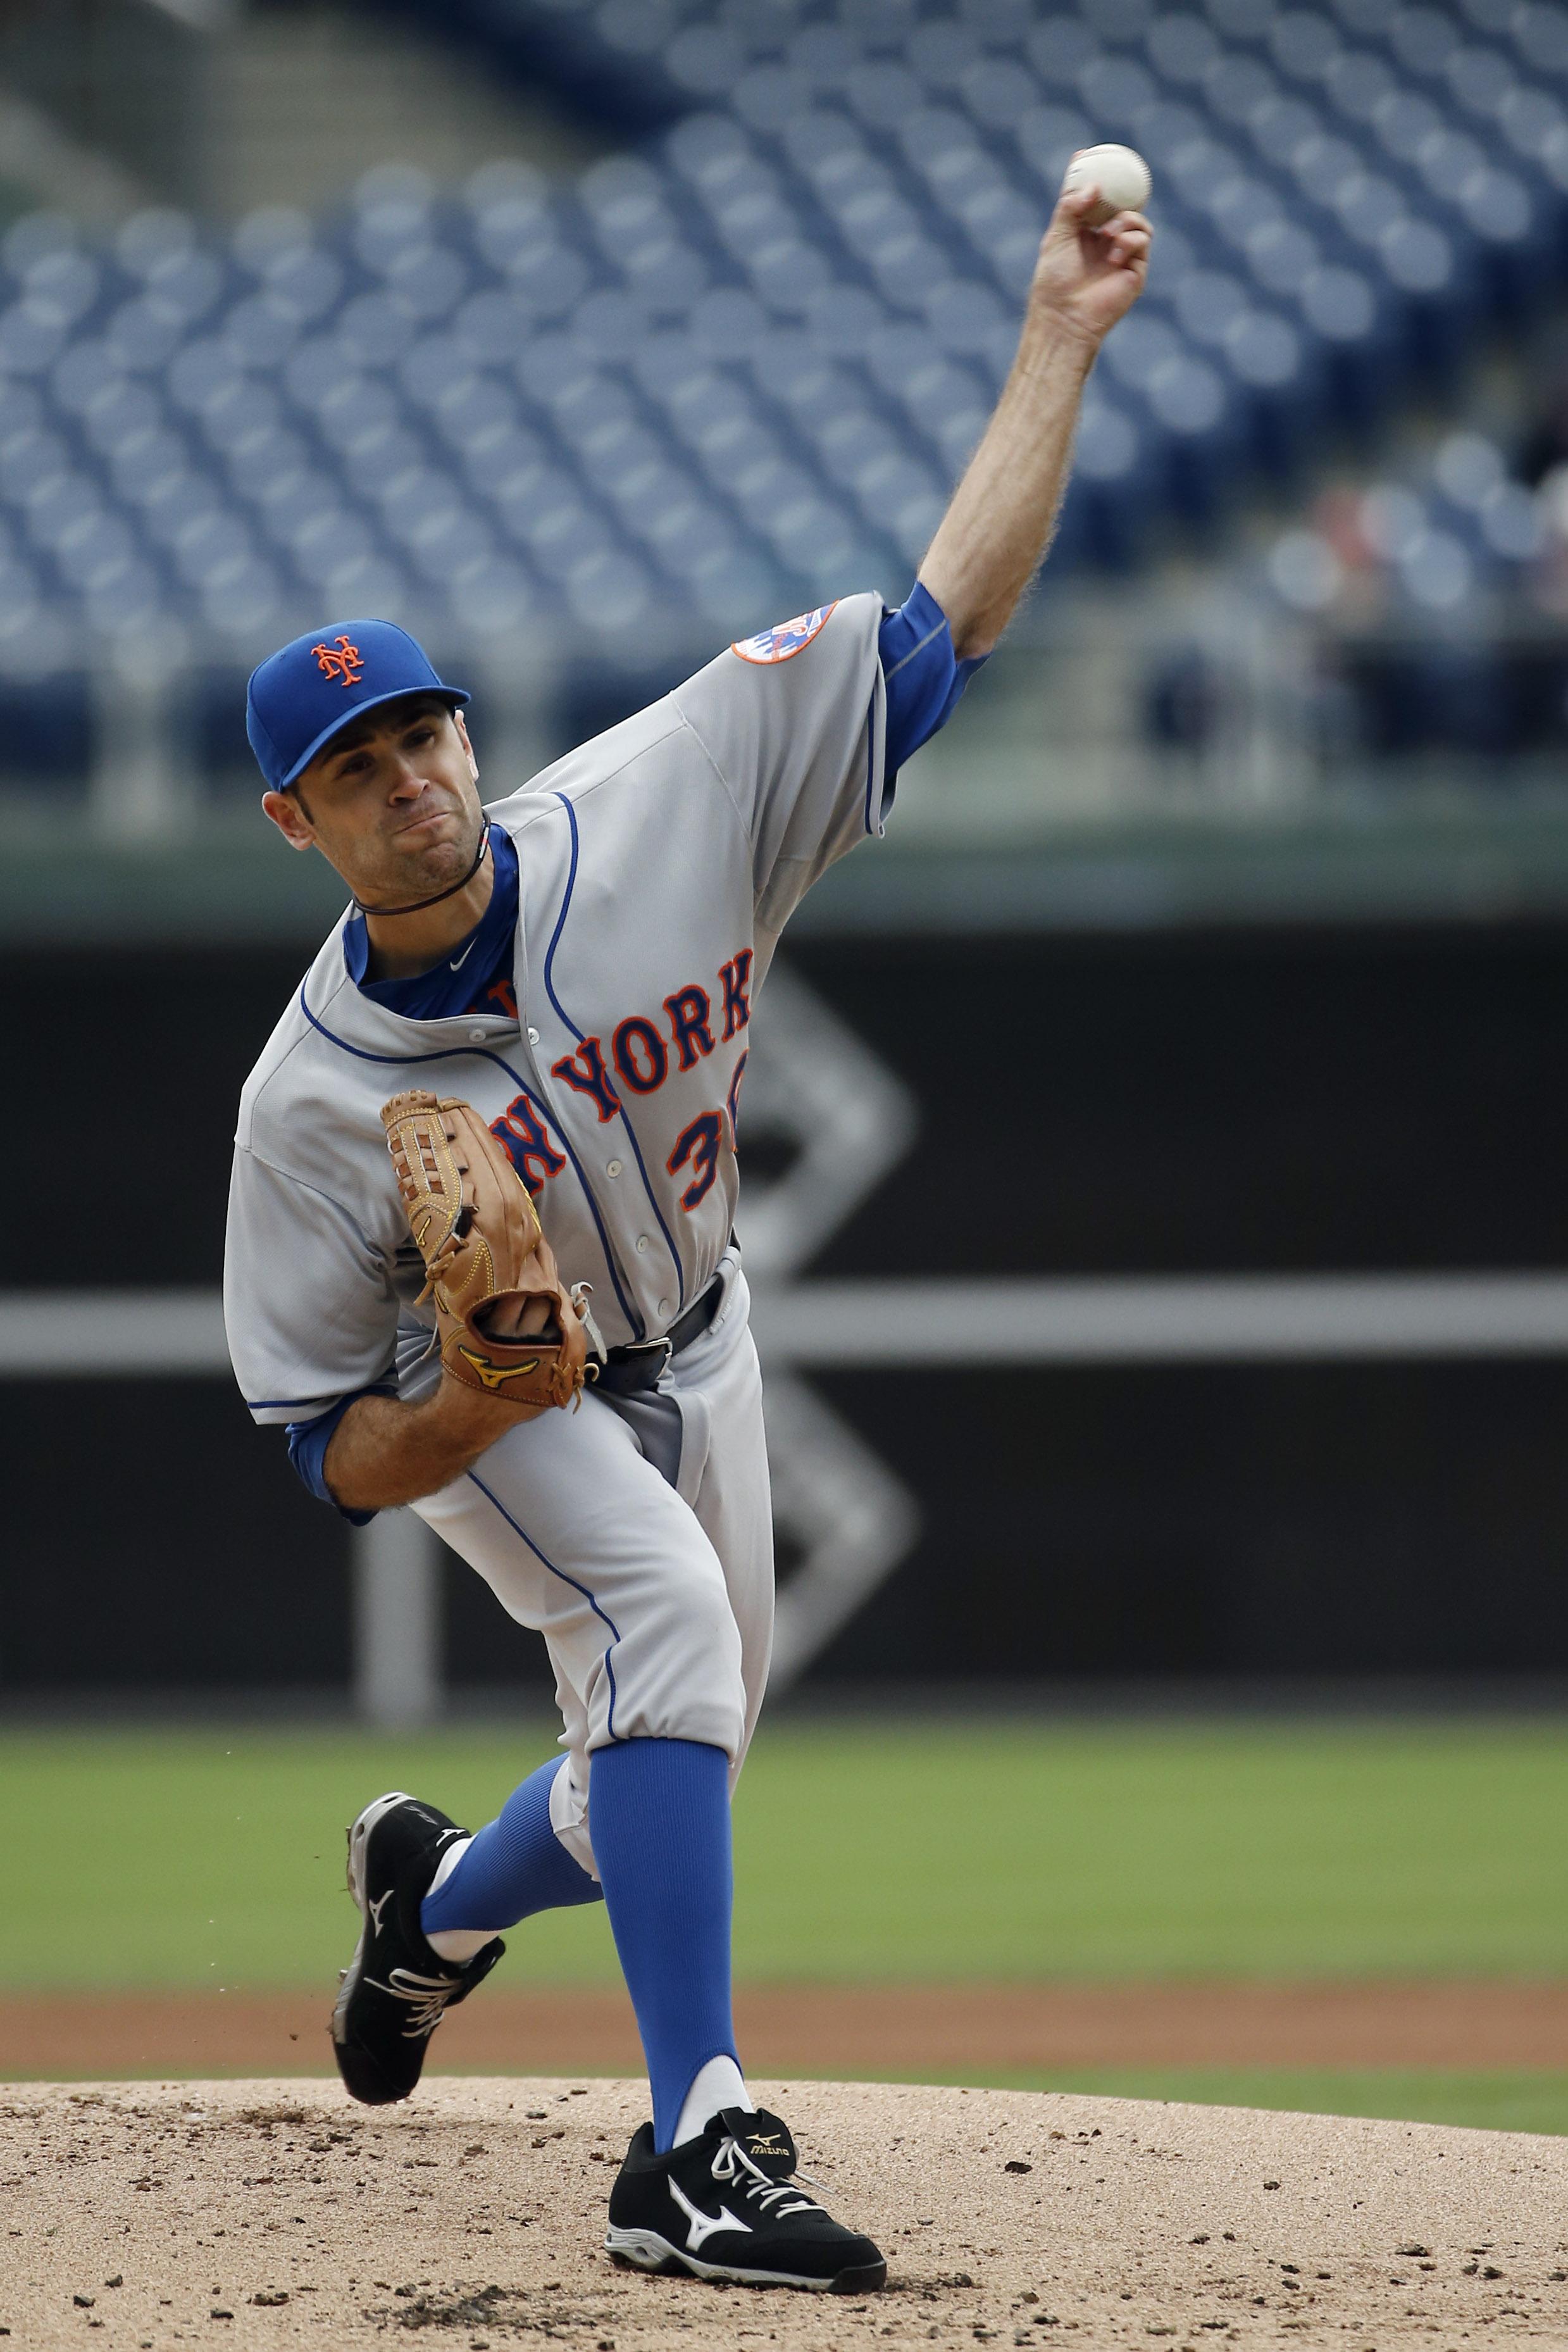 New York Mets' Sean Gilmartin pitches during the first inning of a baseball game against the Philadelphia Phillies, Thursday, Oct. 1, 2015, in Philadelphia. (AP Photo/Matt Slocum)